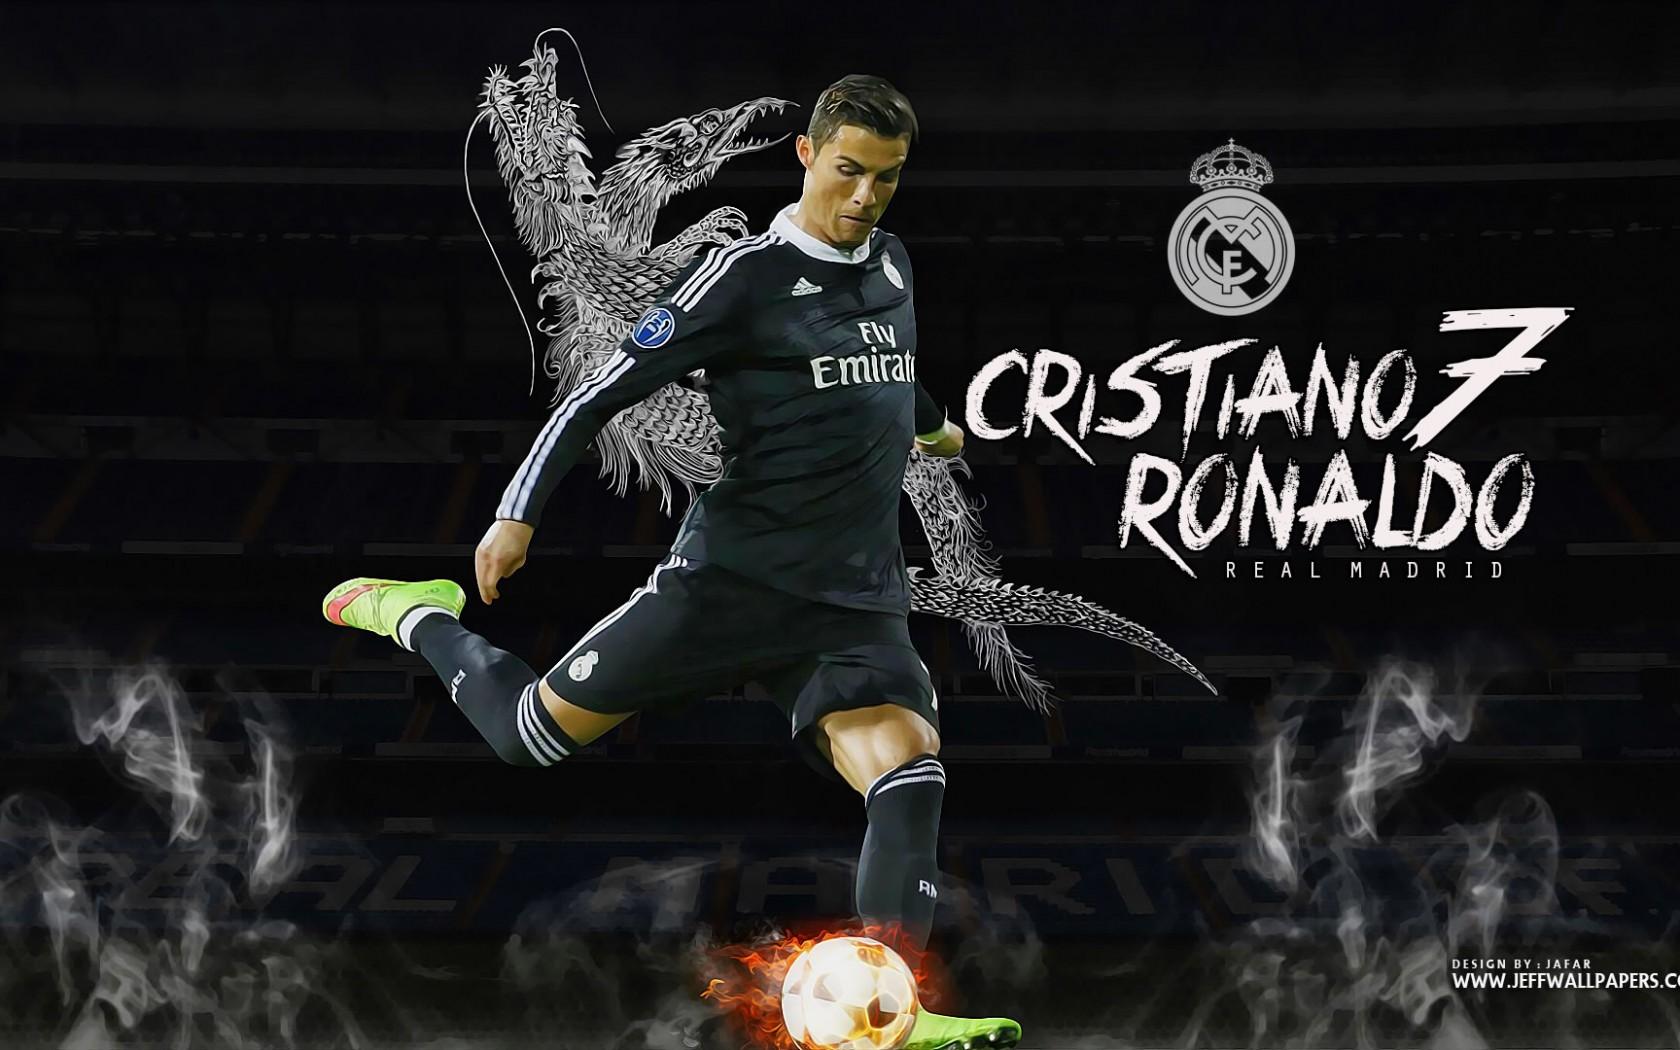 Cr7 Wallpaper Iphone Cristiano Ronaldo Real Madrid Wallpaper By Jafarjeef